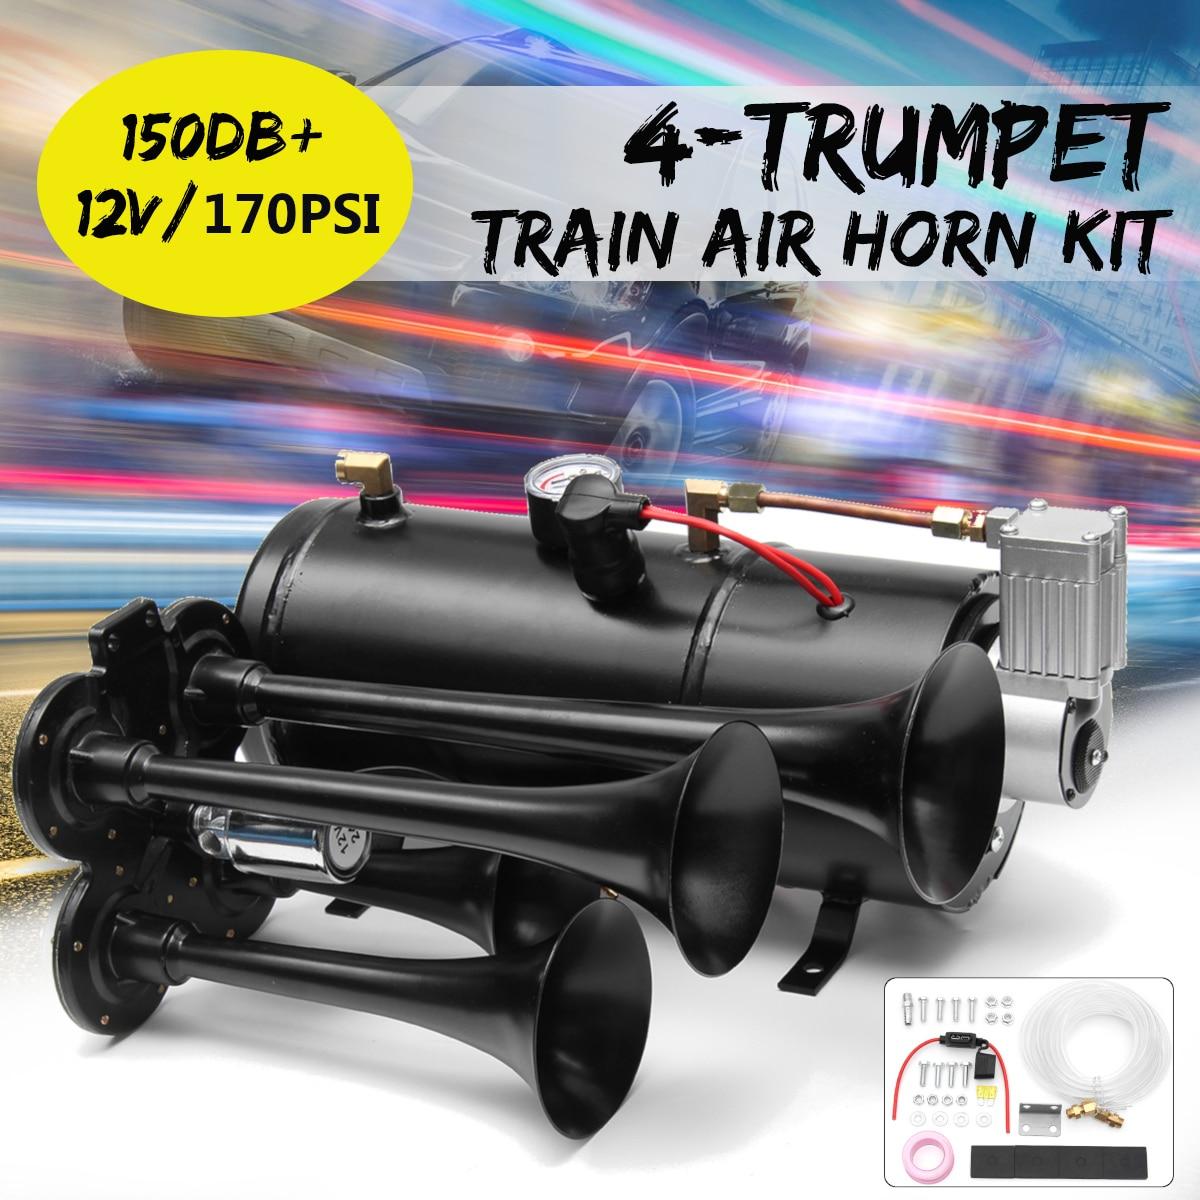 Black Truck Train Quad 4 Trumpet Air Horn Kit 150 PSI 12V 3Liters Compressor & House цена